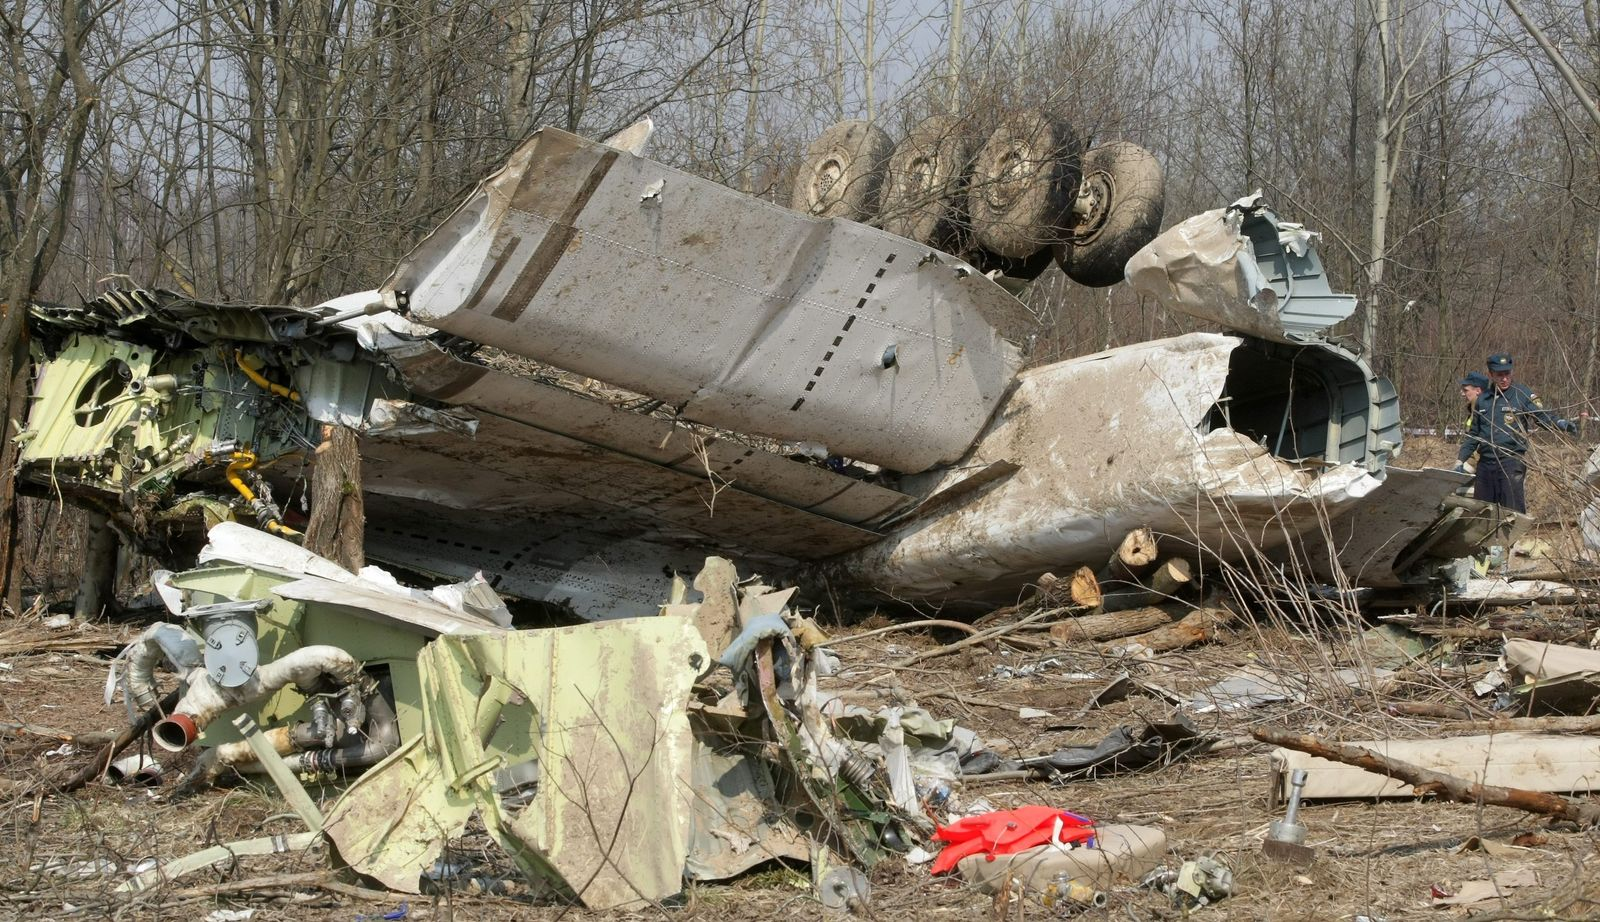 Polen zu Kaczynski-Absturz: Fluglotsen abgelenkt